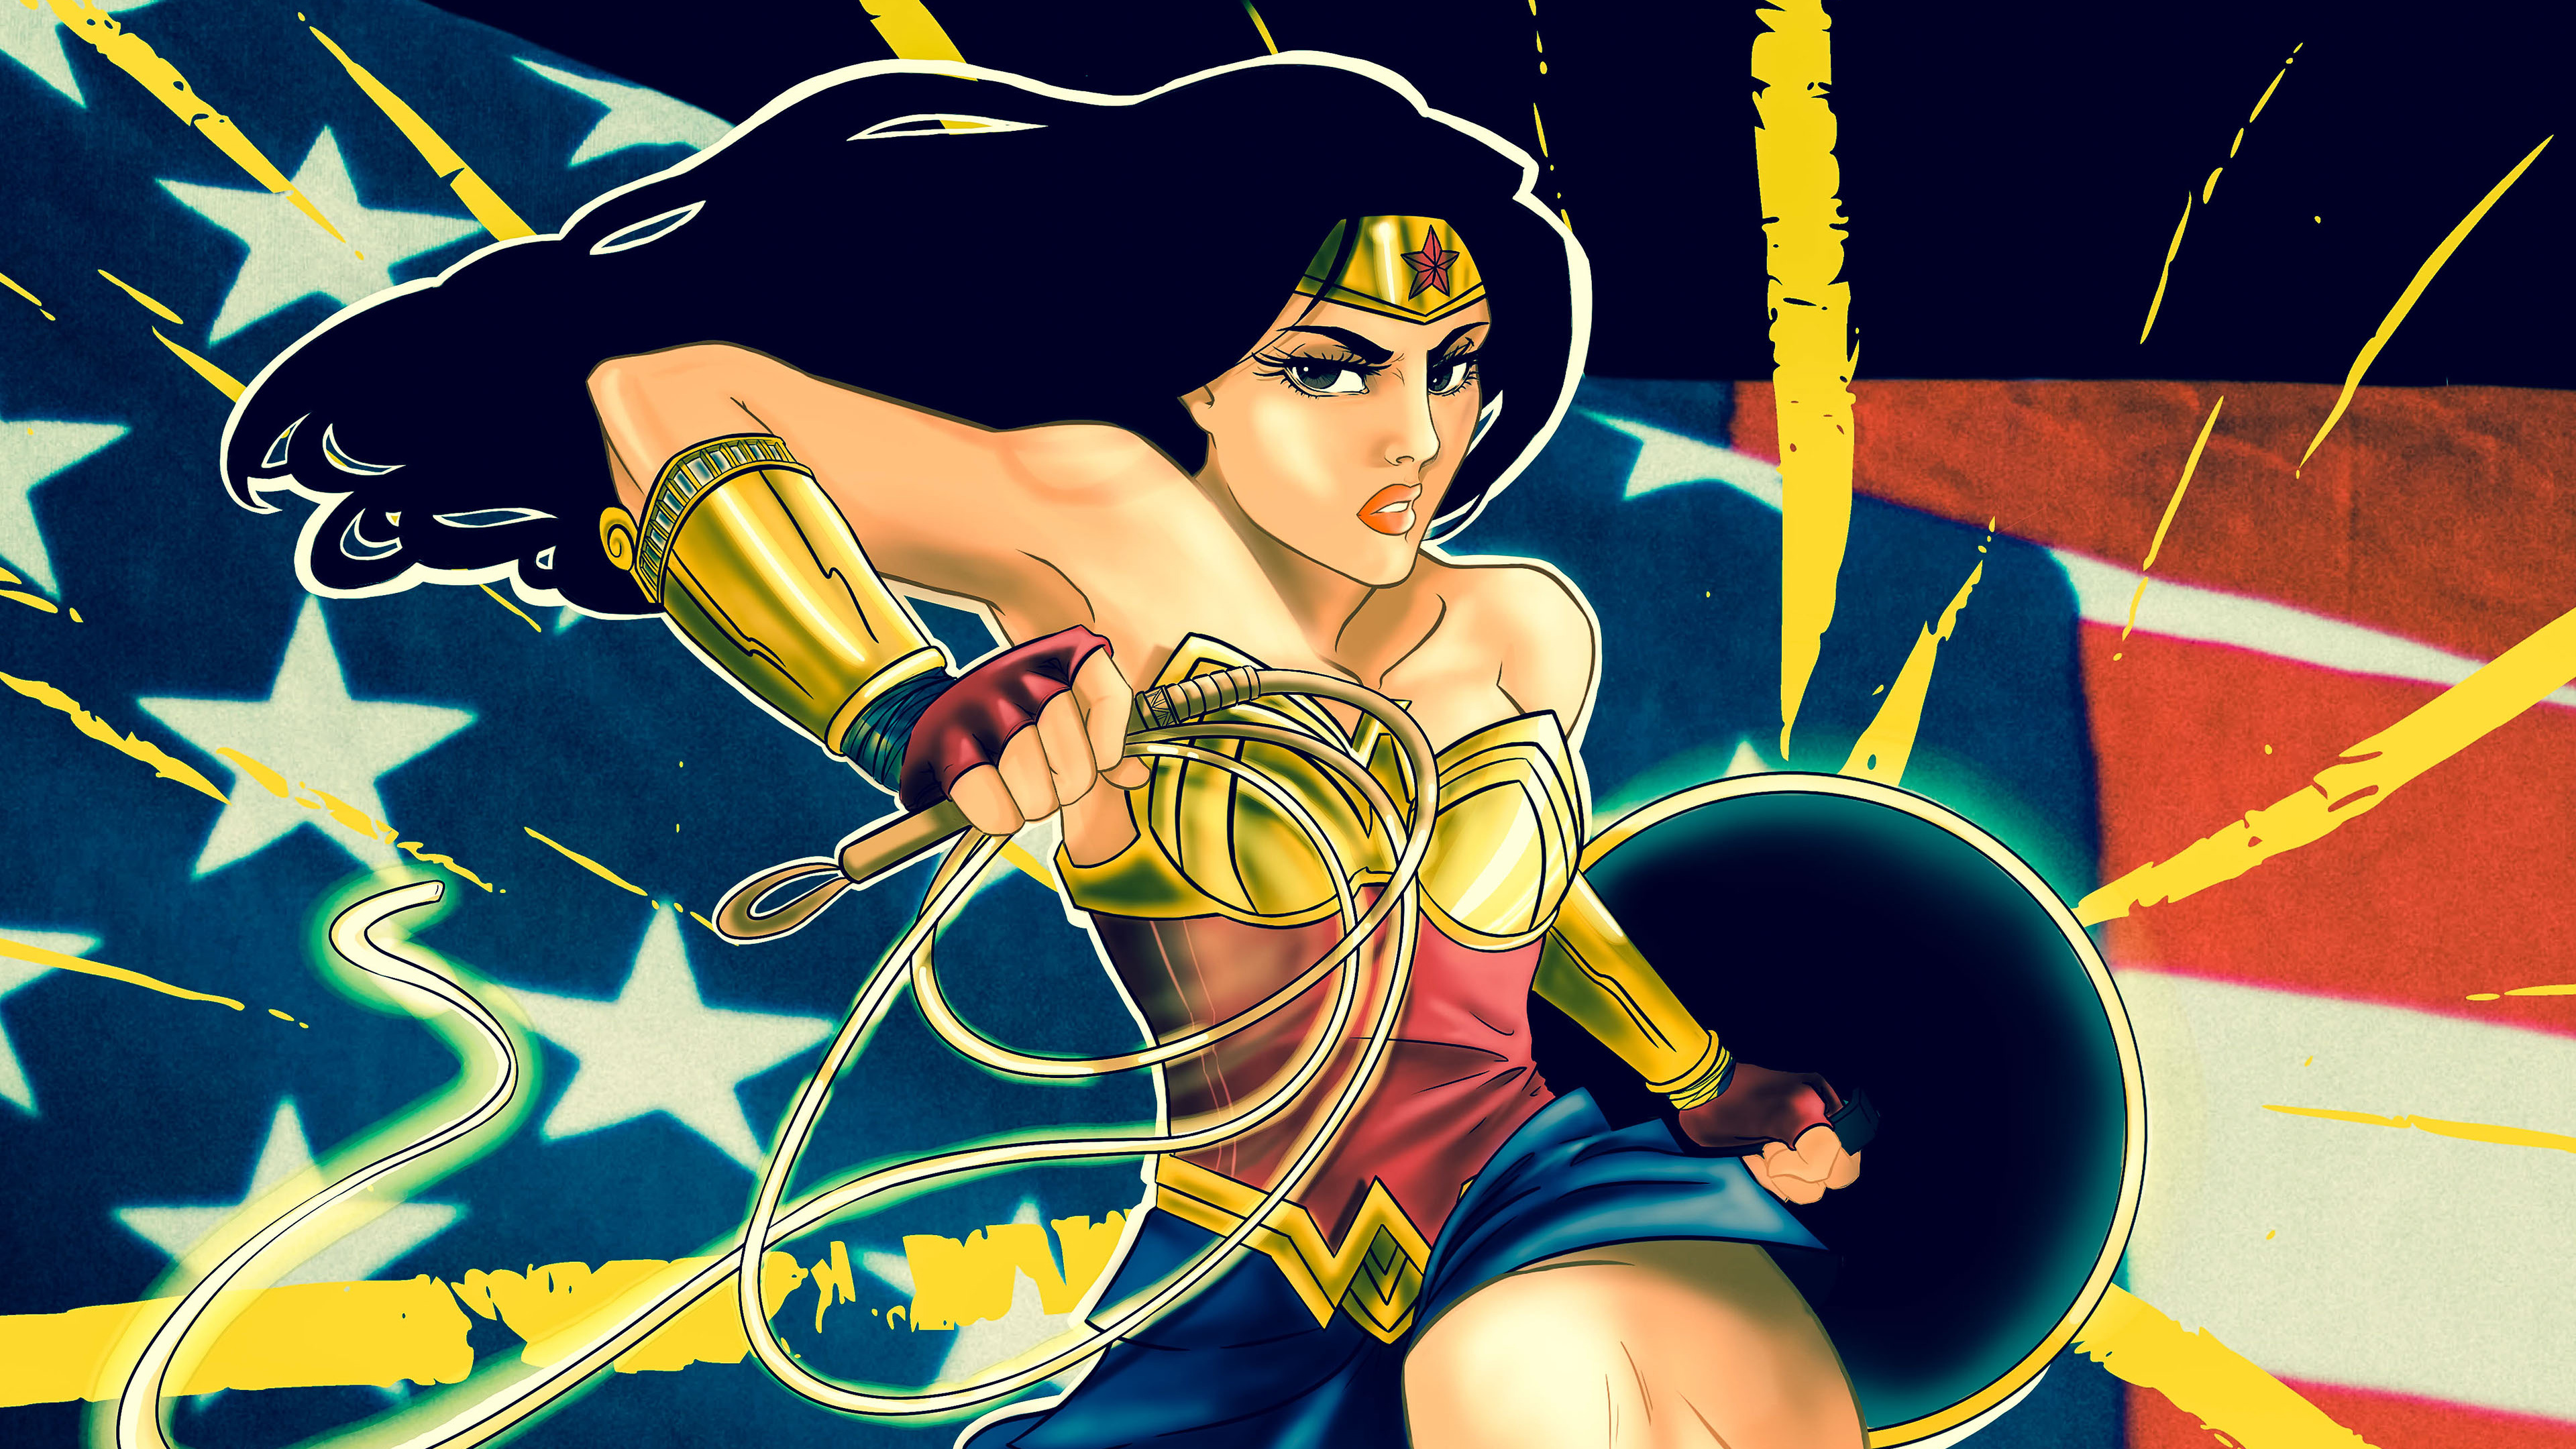 wonder woman original art 4k 1556184997 - Wonder Woman Original Art 4k - wonder woman wallpapers, superheroes wallpapers, hd-wallpapers, digital art wallpapers, behance wallpapers, artwork wallpapers, artist wallpapers, 4k-wallpapers